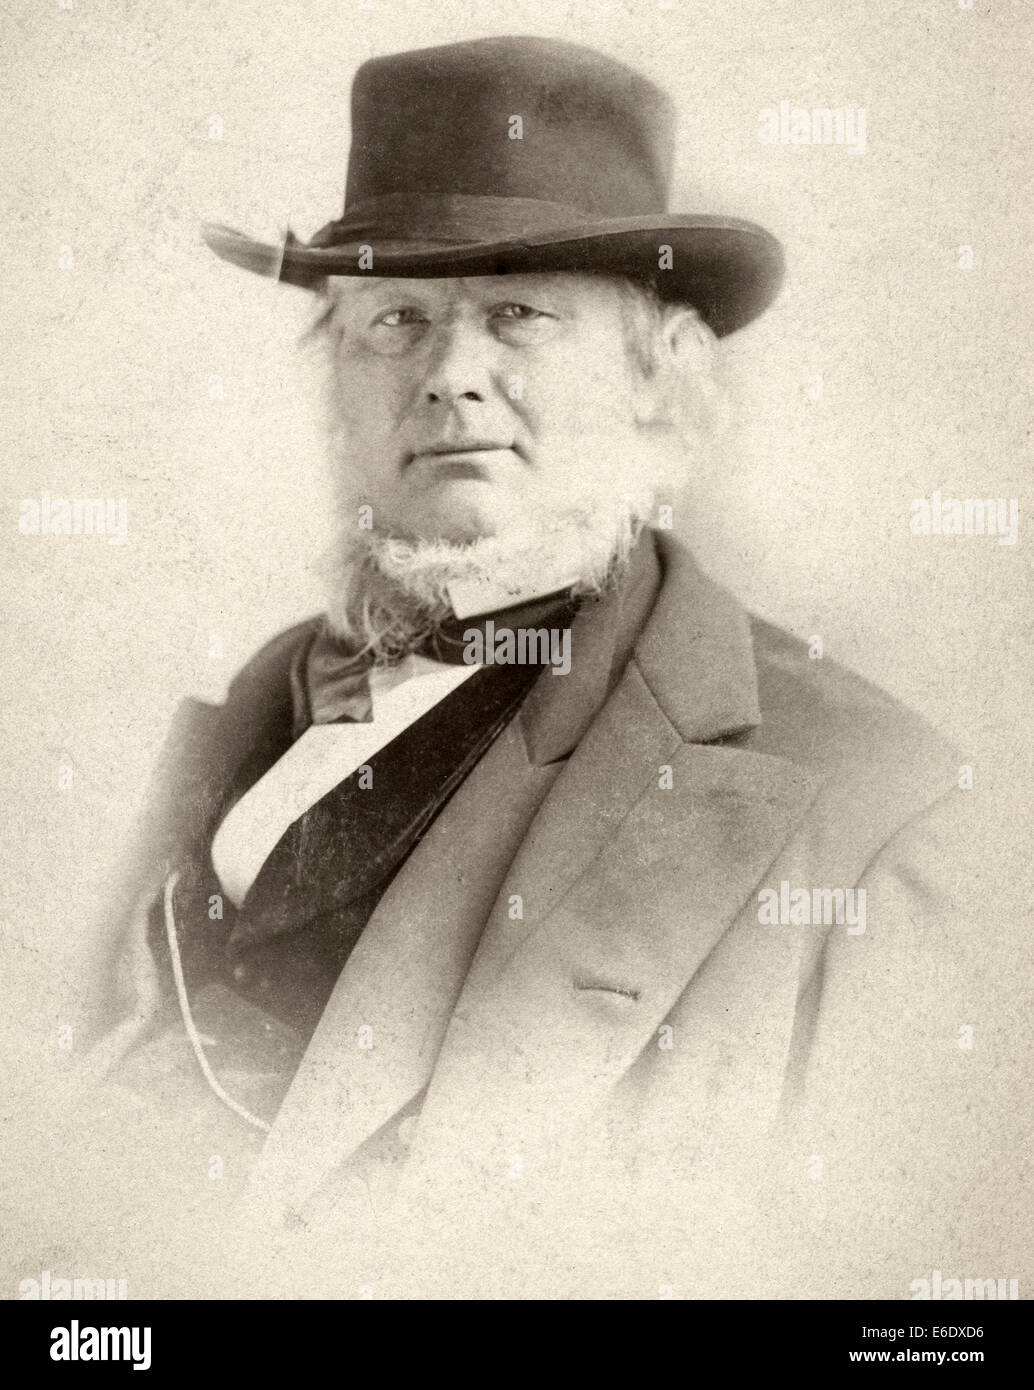 Horace Greeley (1811-1872), American Editor and Politician, Portrait, circa 1870 - Stock Image